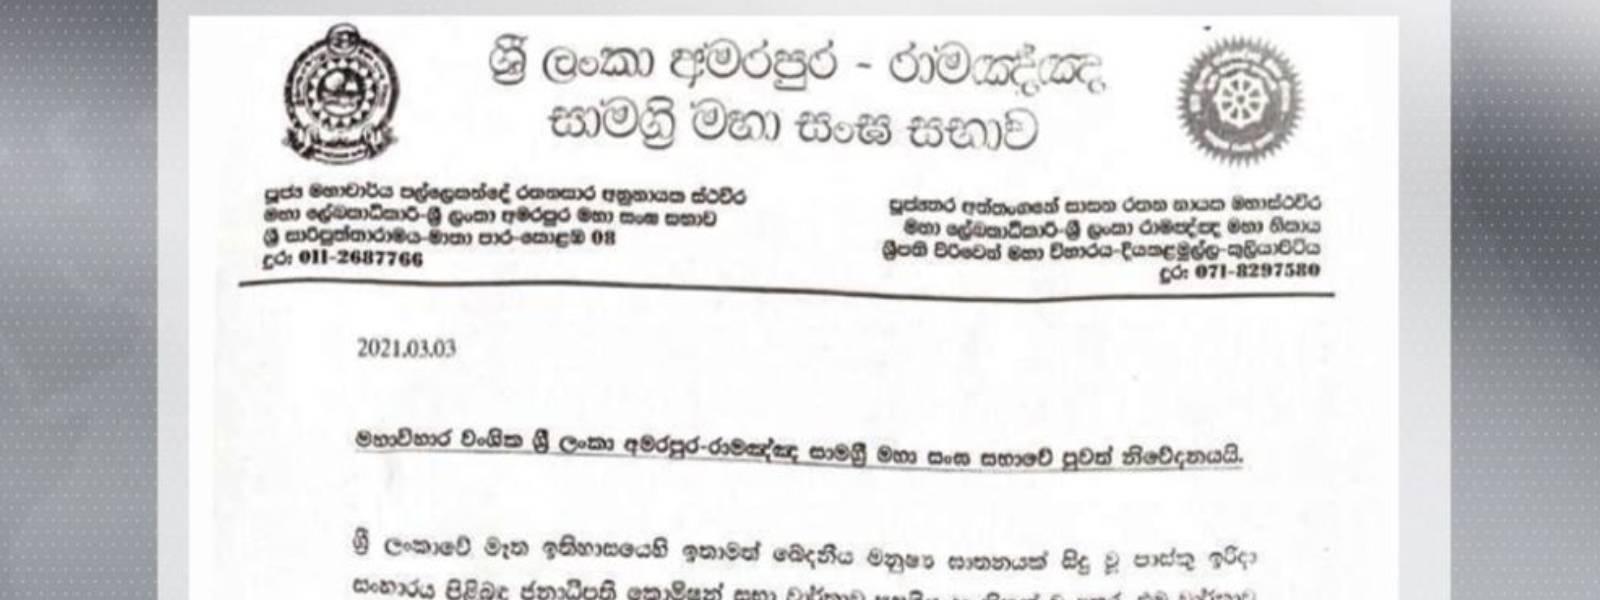 SL Amarapura, Ramanna sects express disappointment